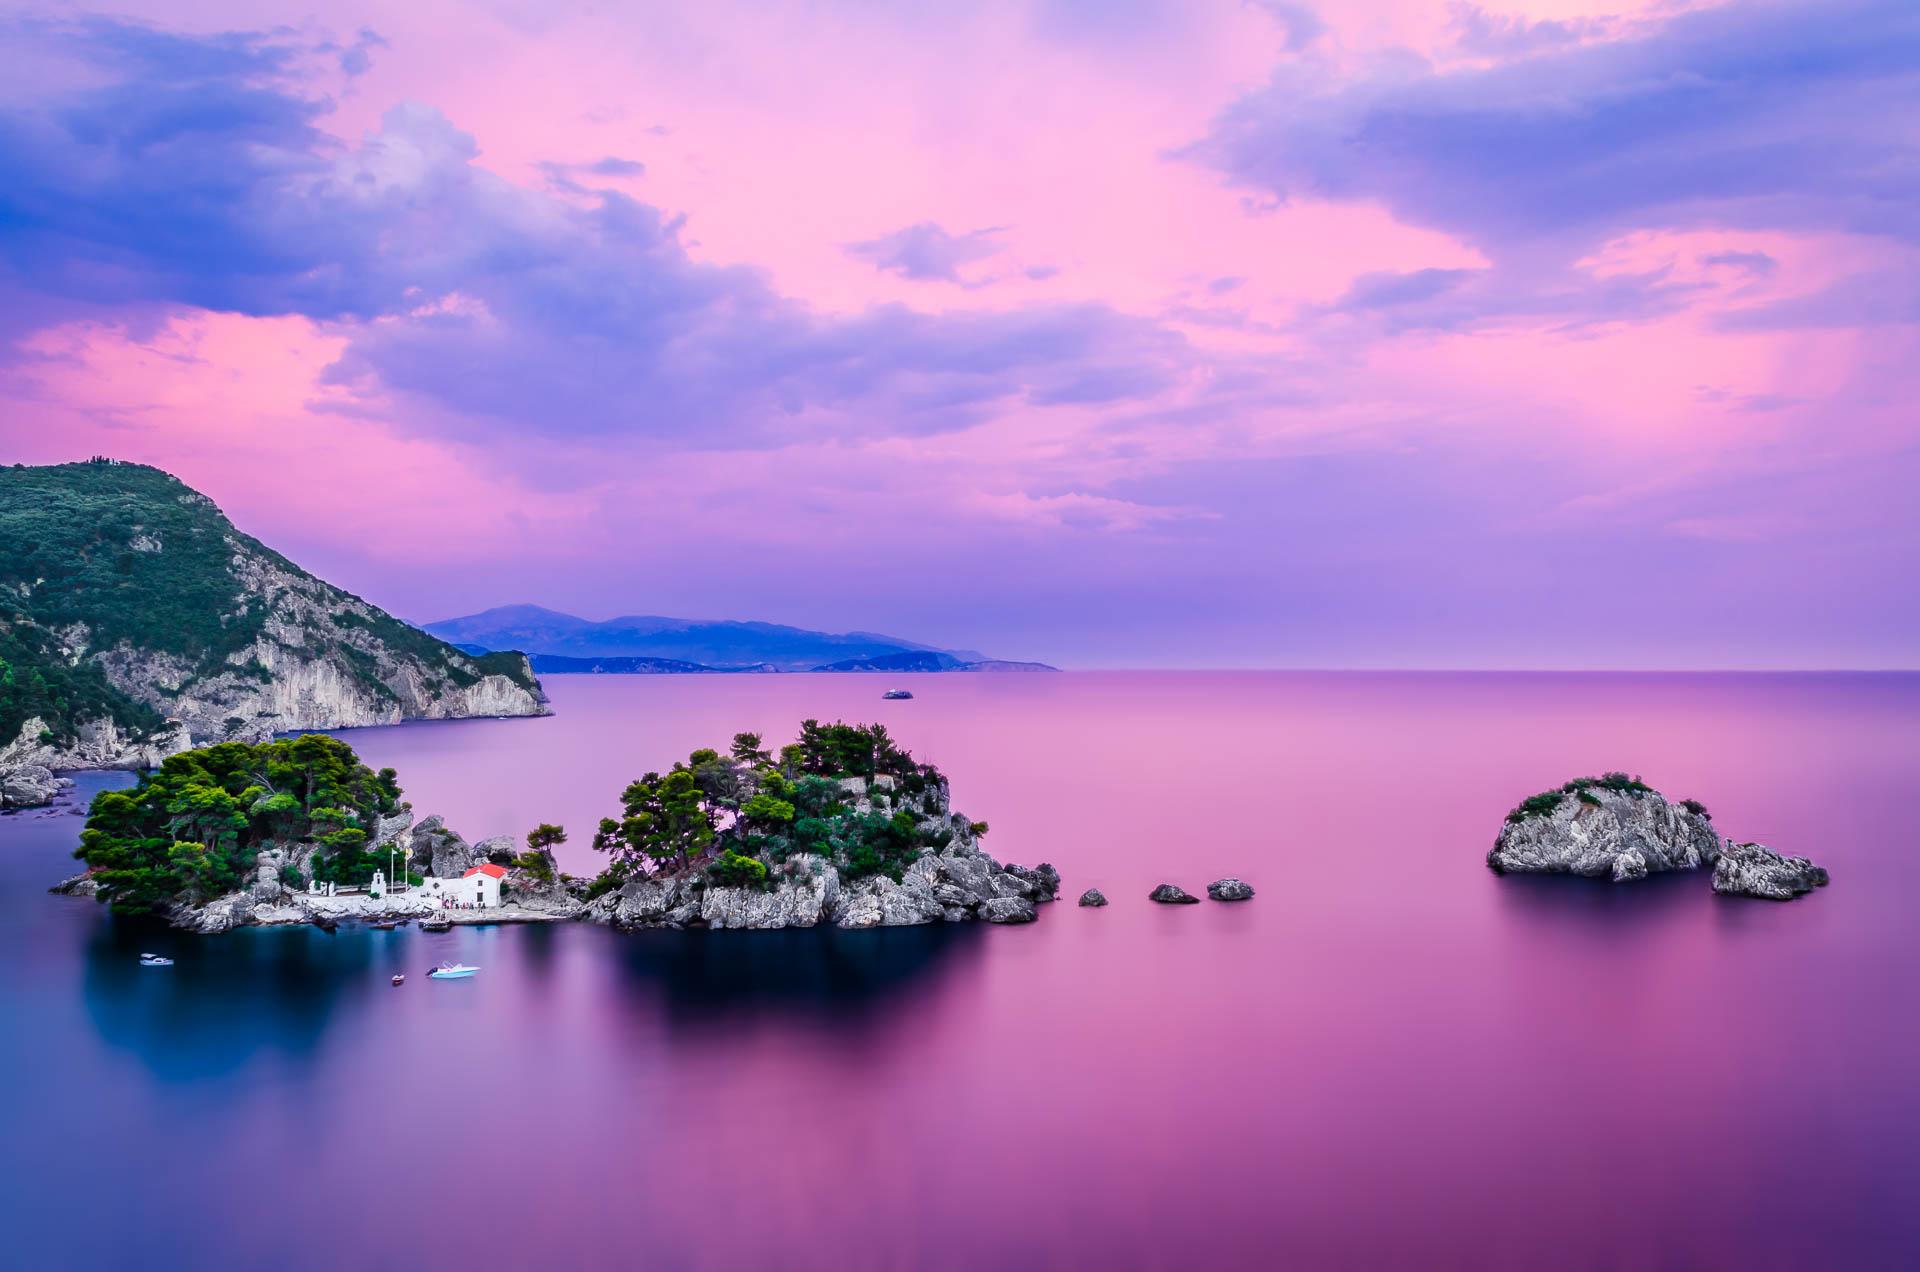 Lady's Island, Parga, Greece